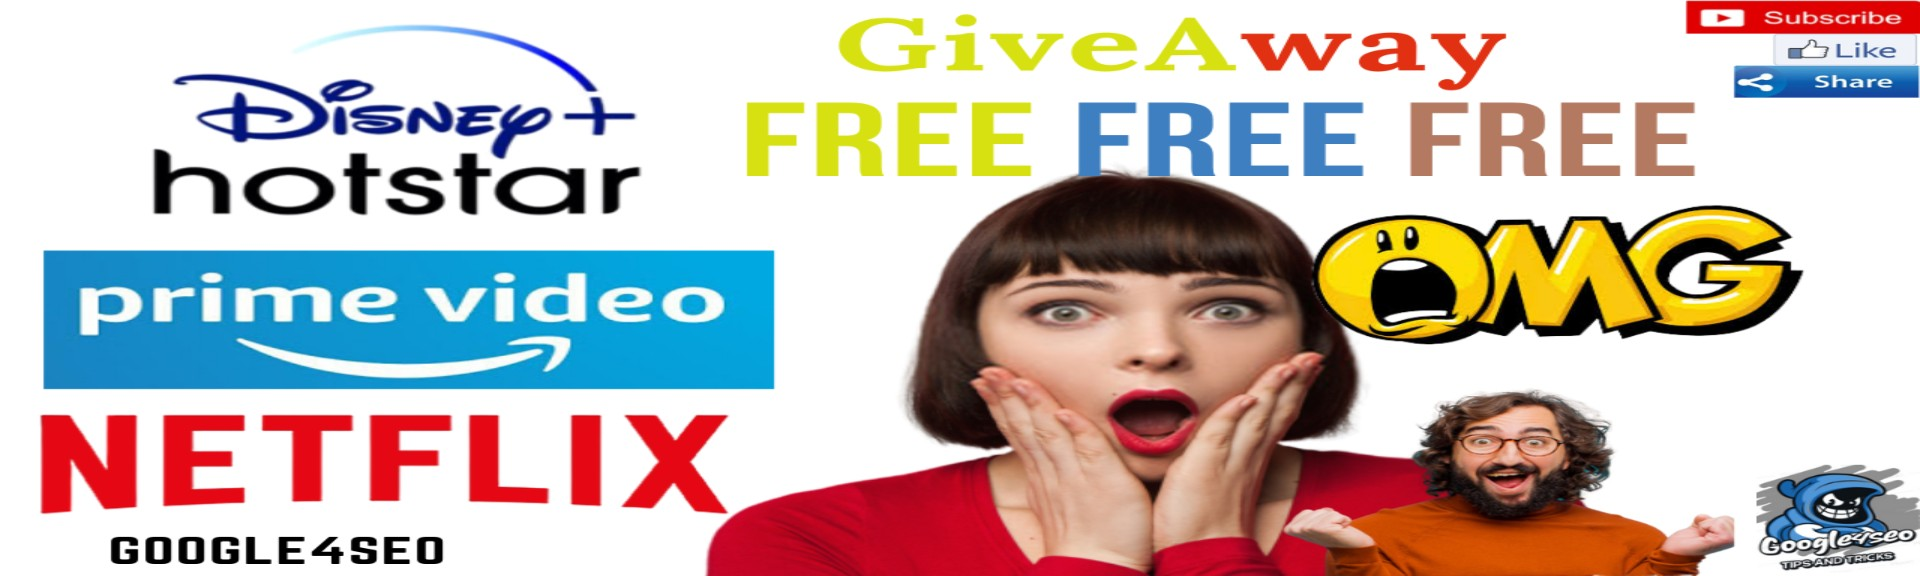 Free Netflix Amazonprimevideo Disney+ Hotstar l Freetricks2020